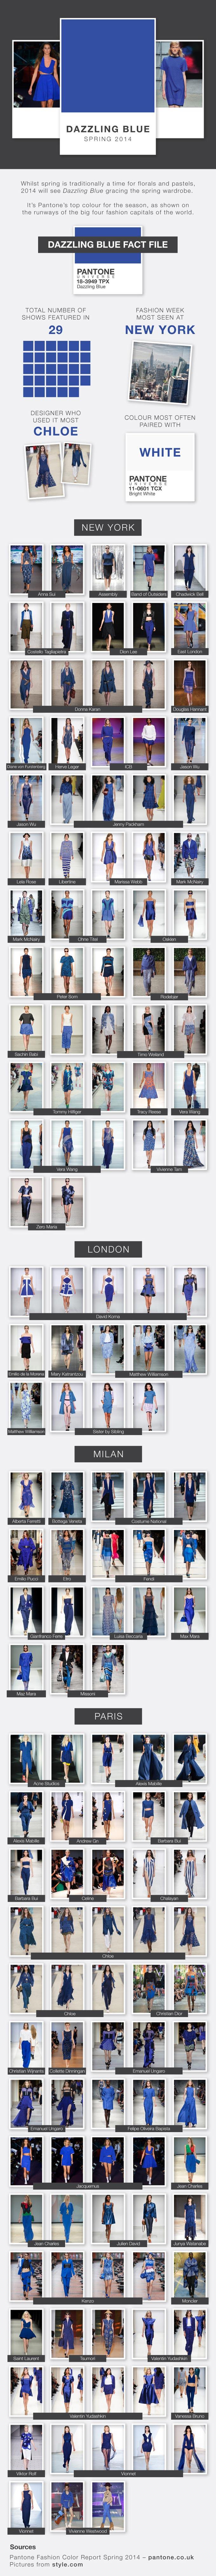 5. Dazzling Blue this season